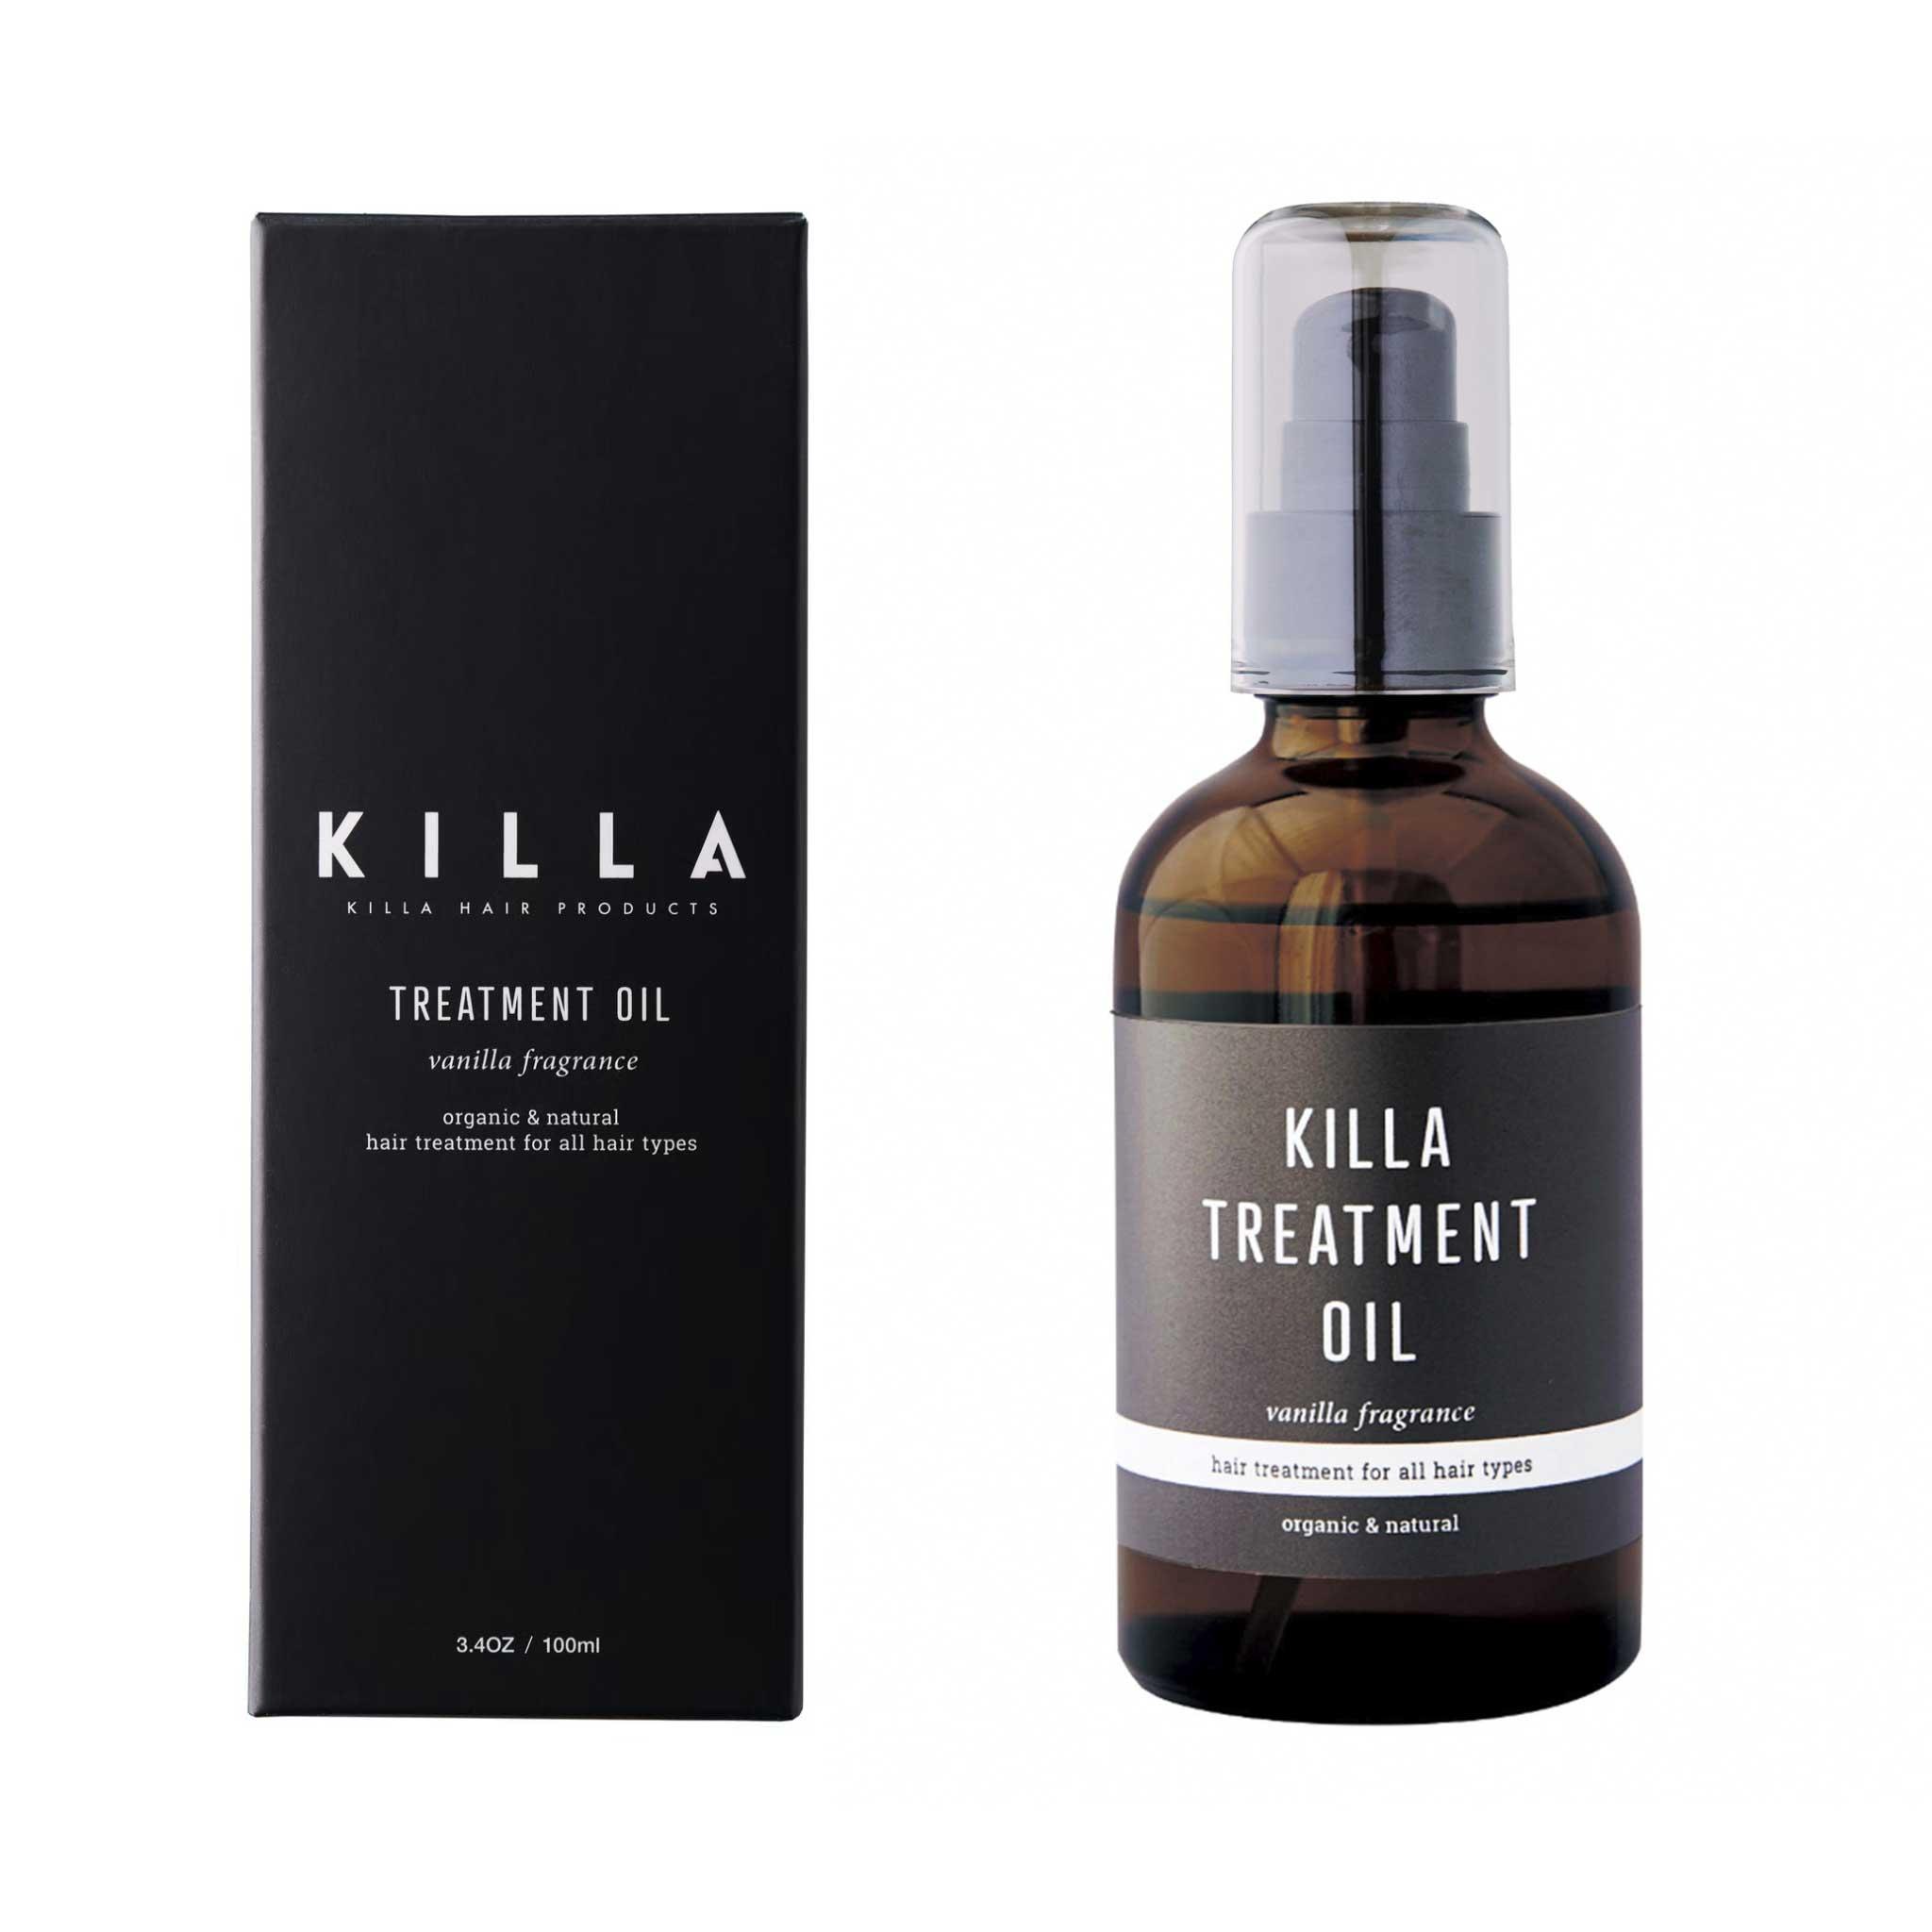 KILLA TREATMENT OIL【キラ トリートメント オイル】